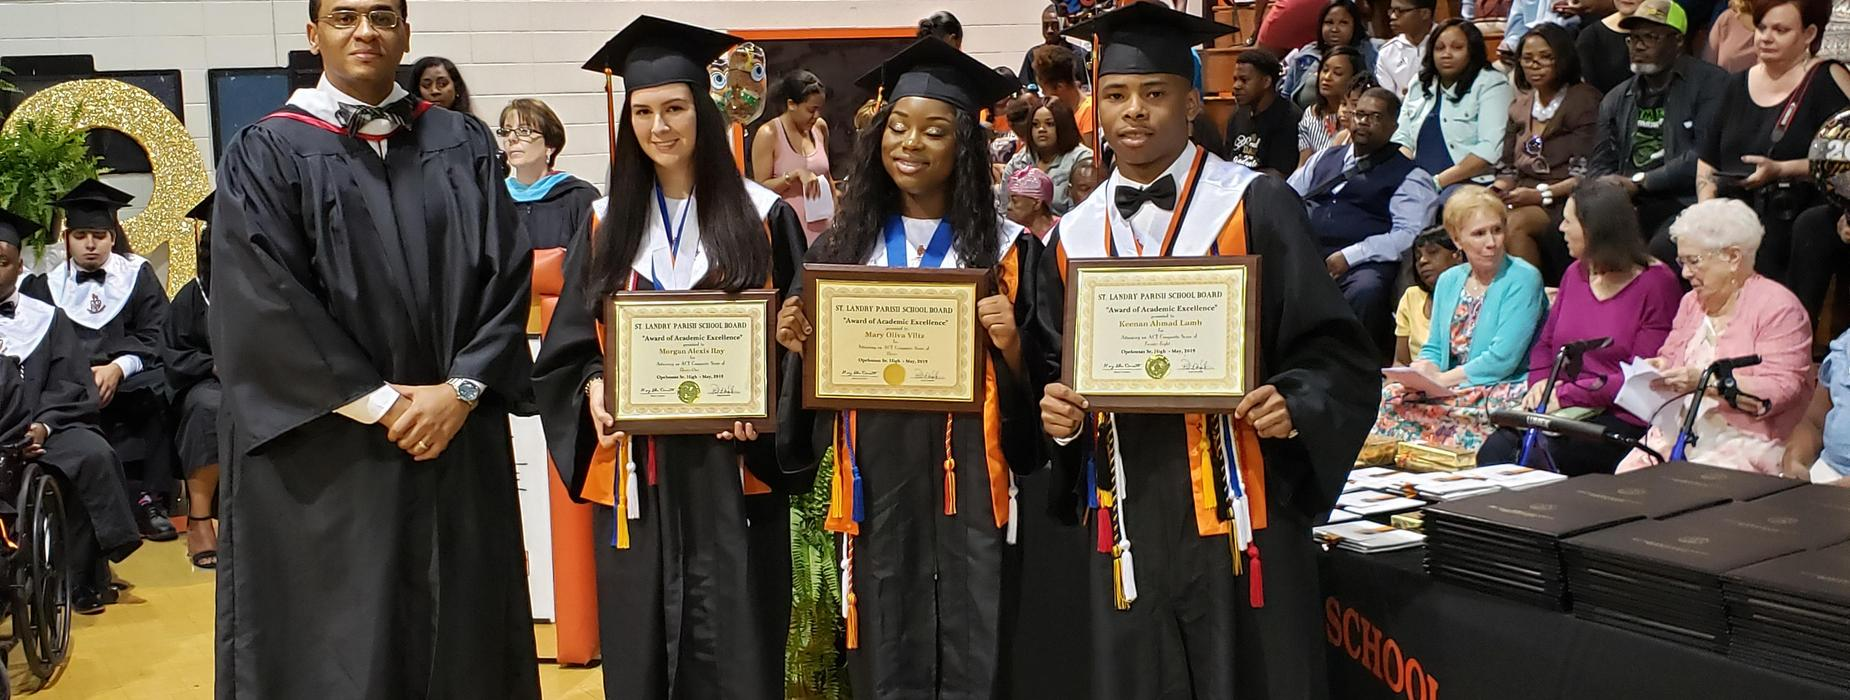 Morgan Ray, Mary Olivia Viltz, and Keenan Lamb received the SLPSB